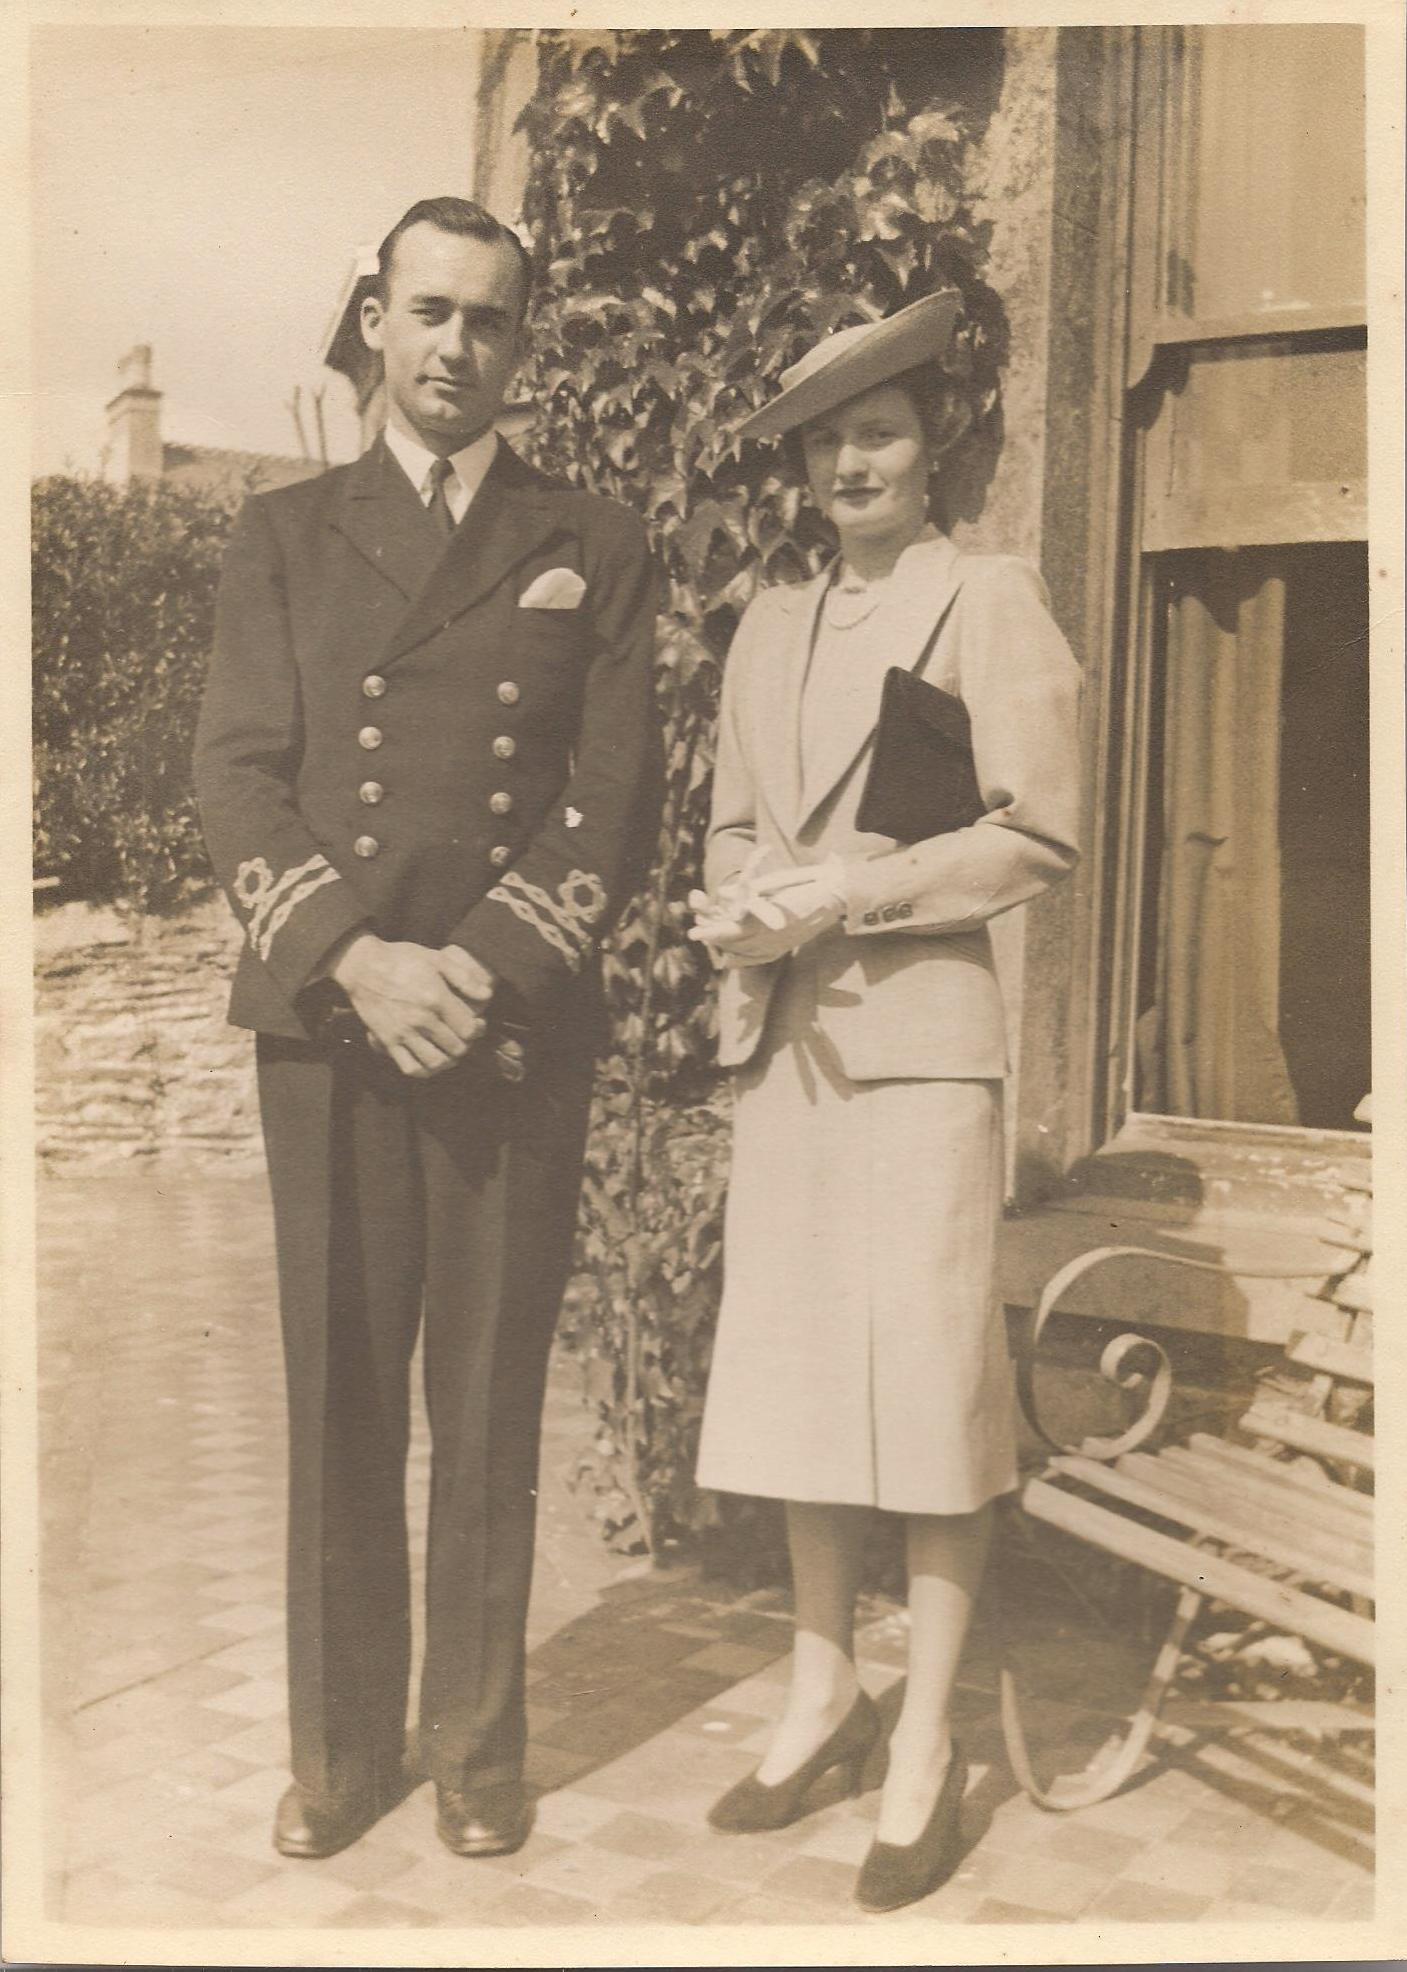 Group Photo– Lieutenant Daniel Edward Treymain Newell with his wife Margaret Yvonne Newell.